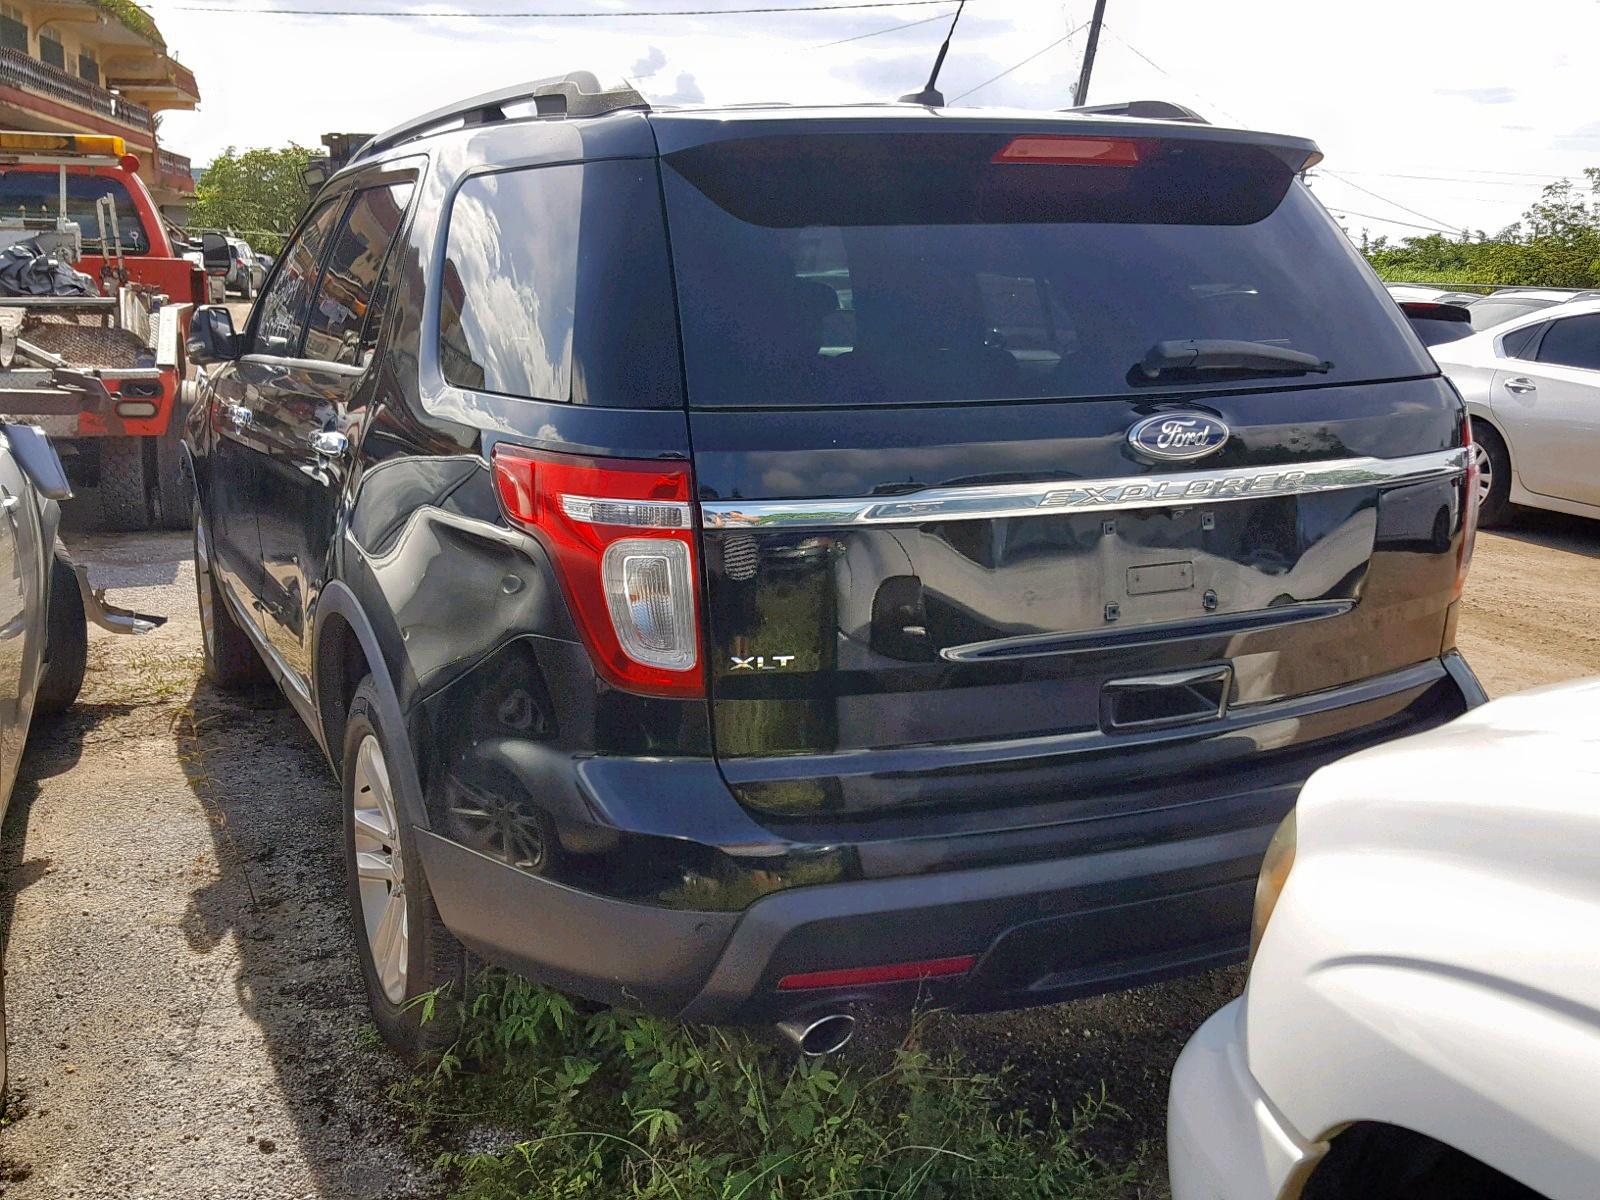 1FMHK7D85CGA54259 - 2012 Ford Explorer X 3.5L [Angle] View